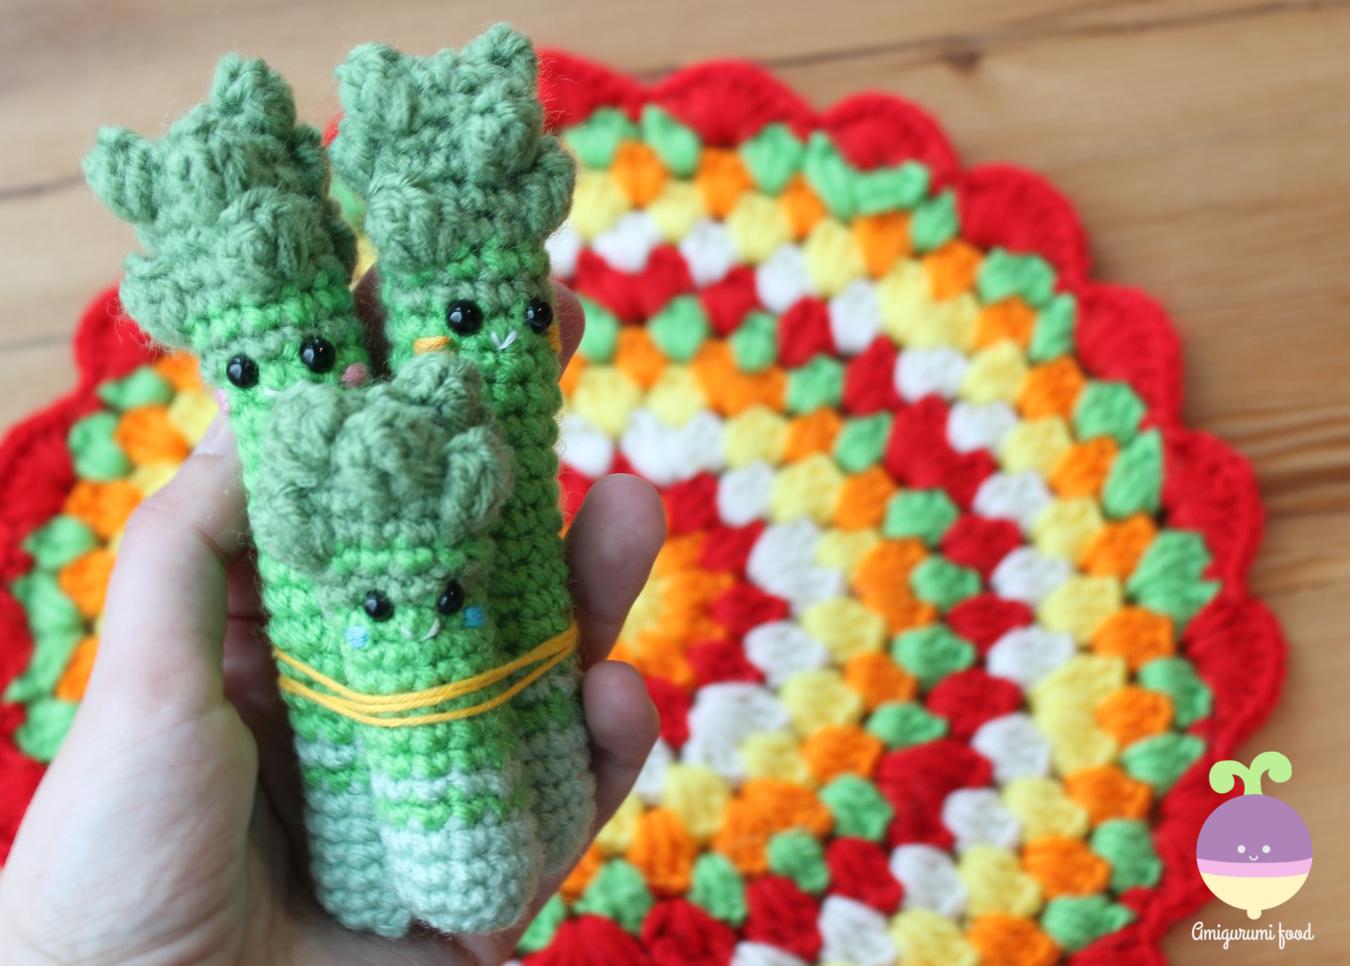 Amigurumi Crochet Food Patterns : Amigurumi Food: Amigurumi Food on Etsy